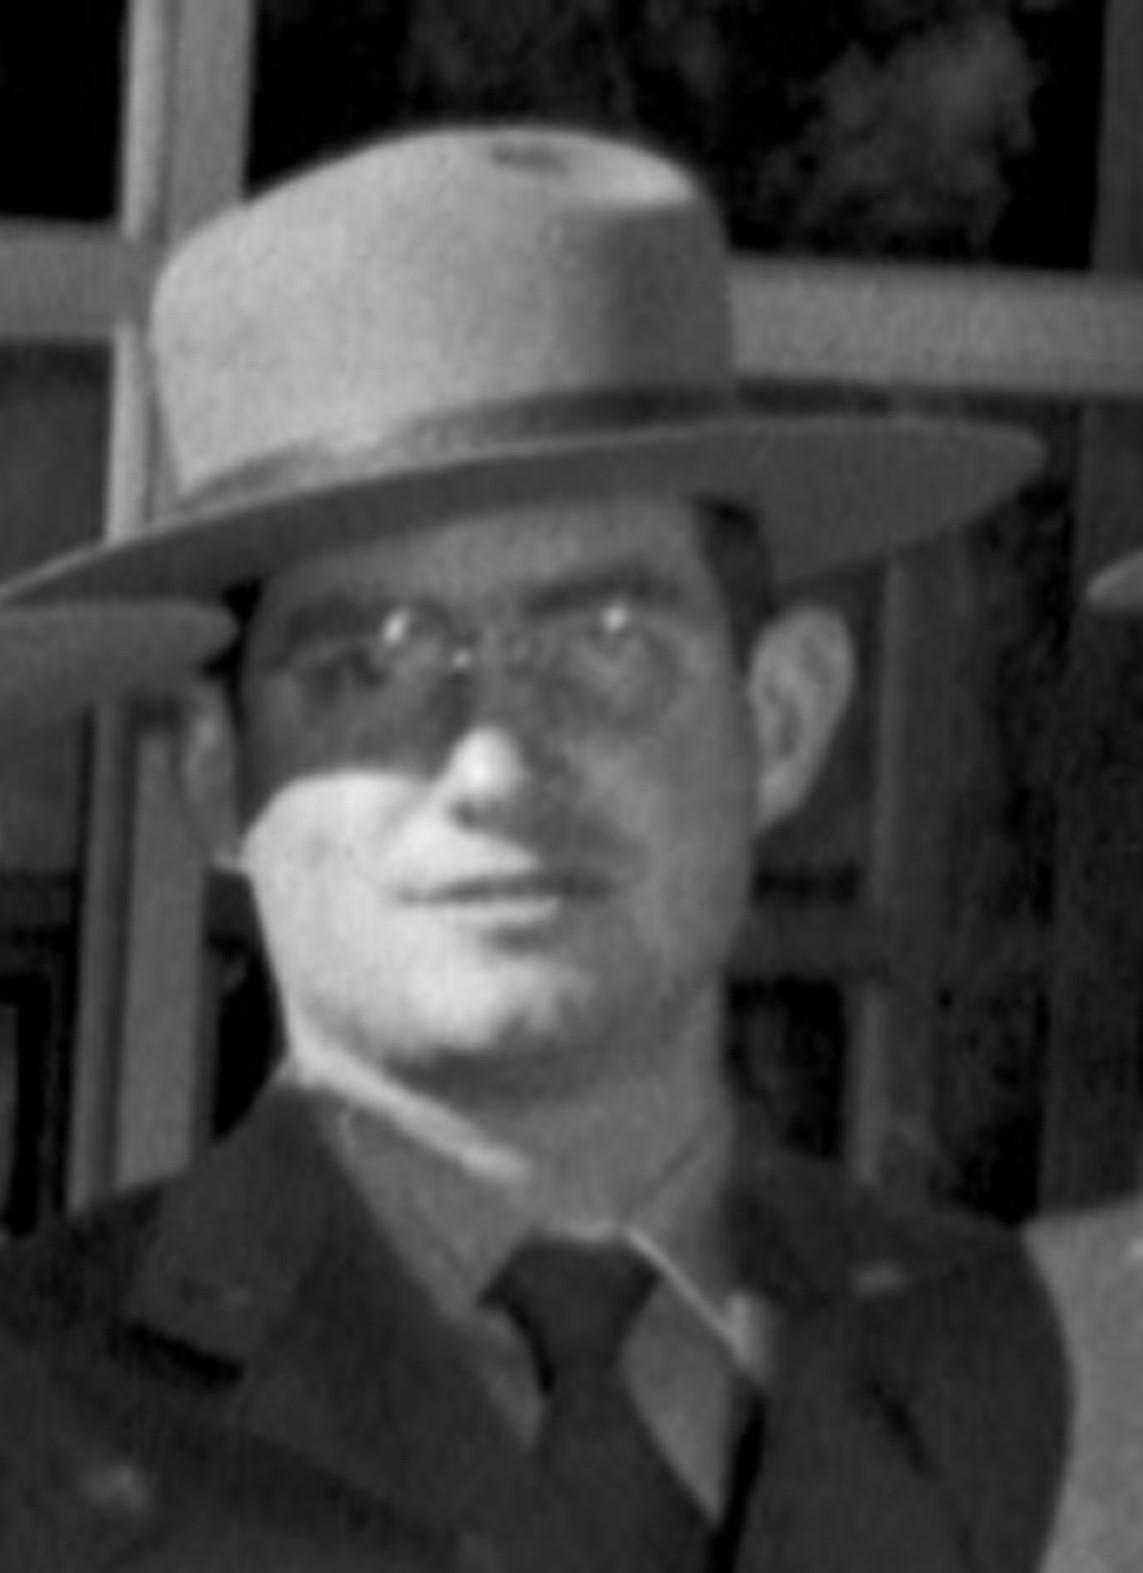 Park Ranger James Donald Vaughn | United States Department of the Interior - National Park Service, U.S. Government